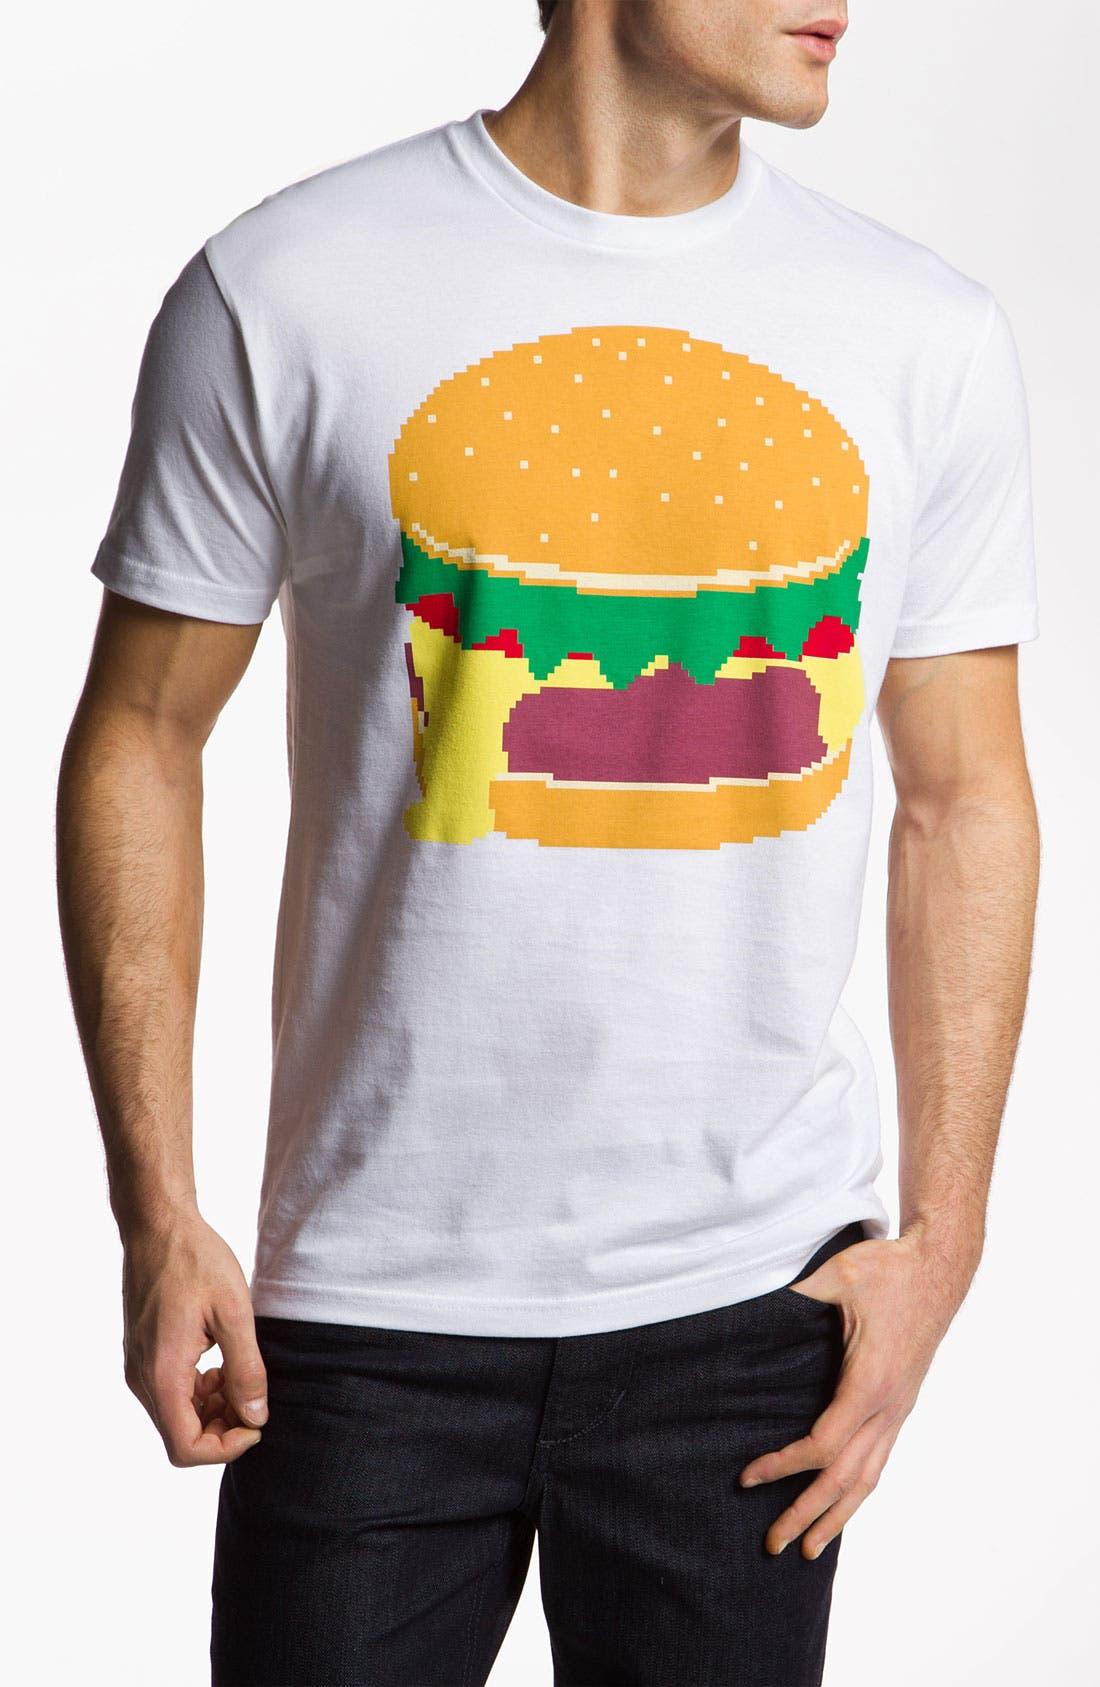 Main Image - Kid Dangerous Grime Couture 'Cheeseburger' Graphic T-Shirt